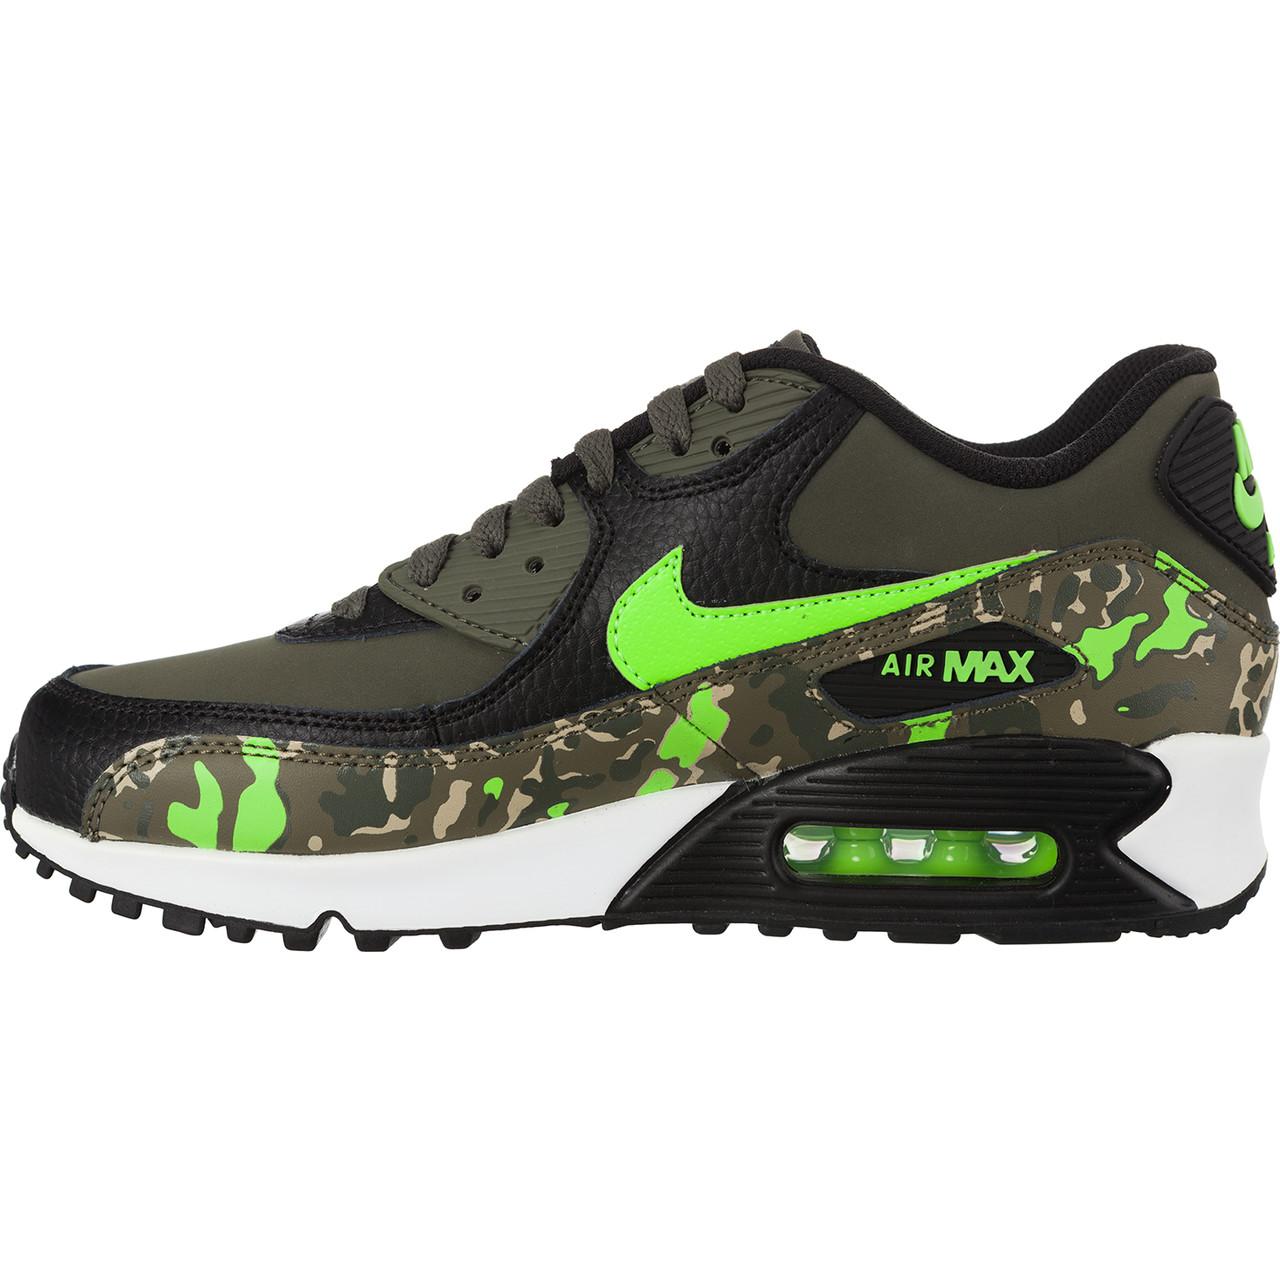 Buty Nike Air Max 90 Prem Ltr GS 003 eastend.pl